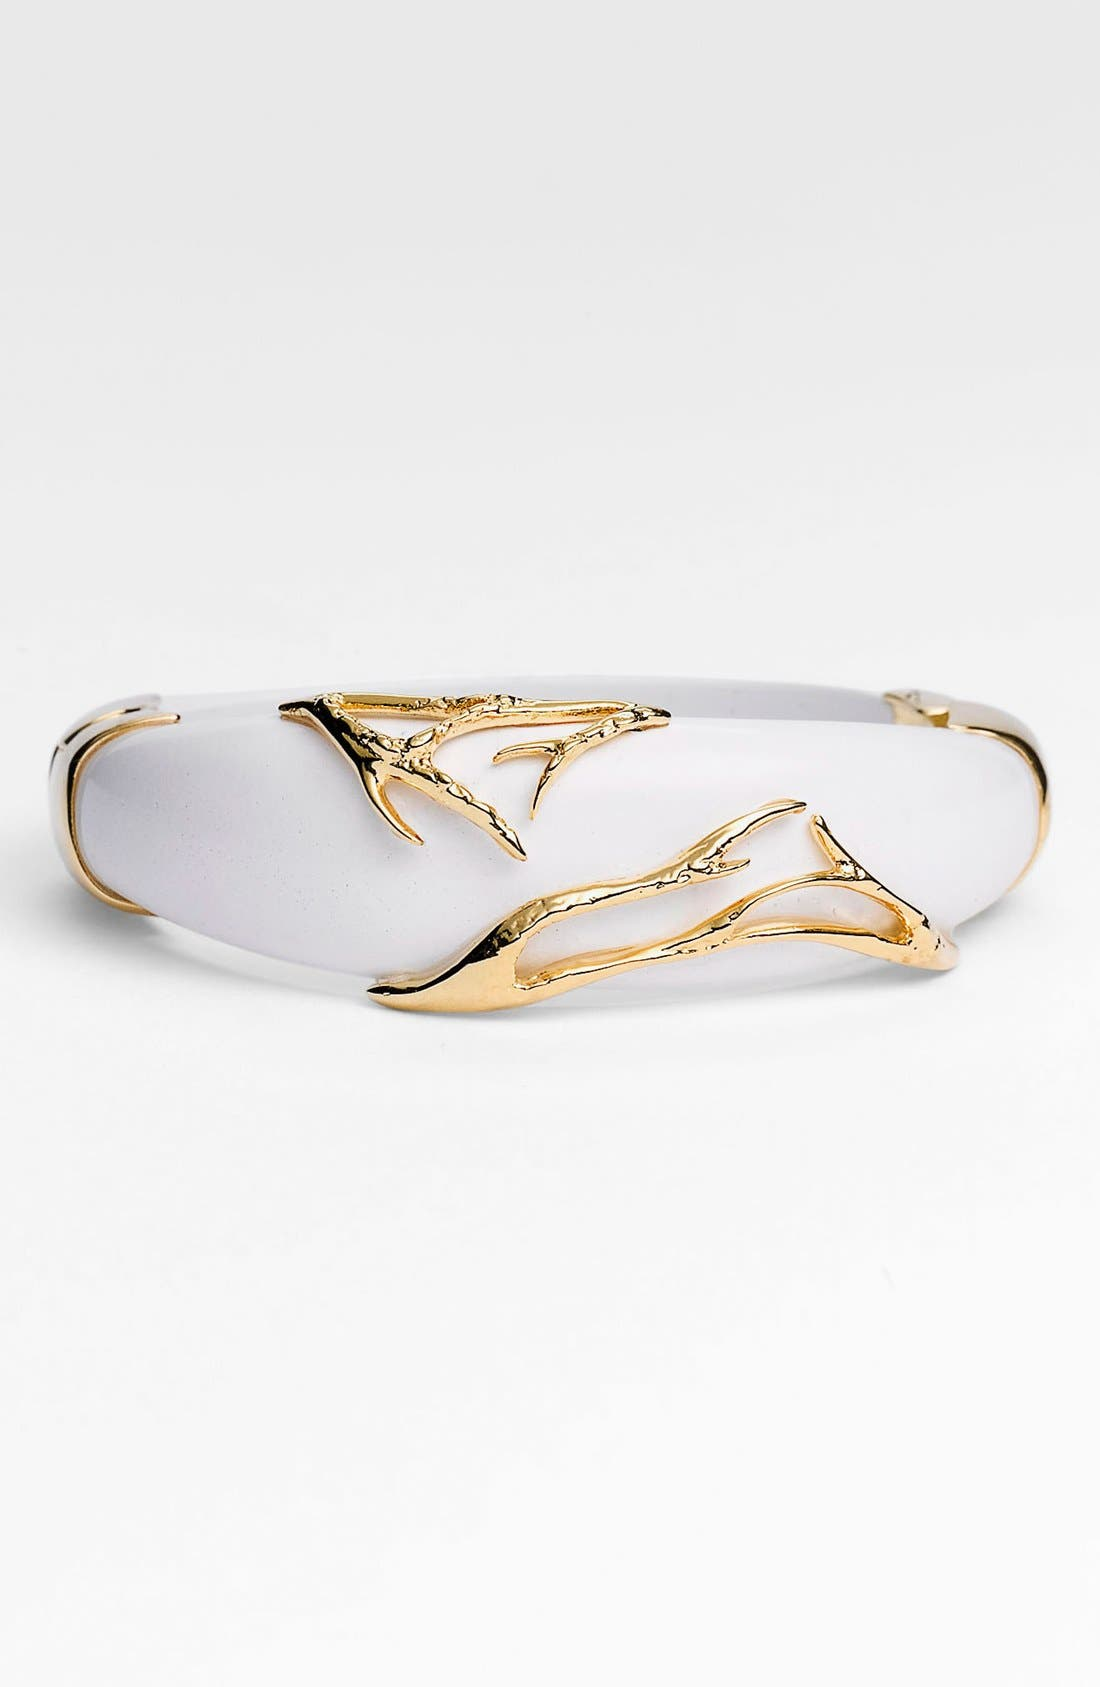 Main Image - Alexis Bittar 'Miss Havisham - Liquid Gold' Tapered Bracelet